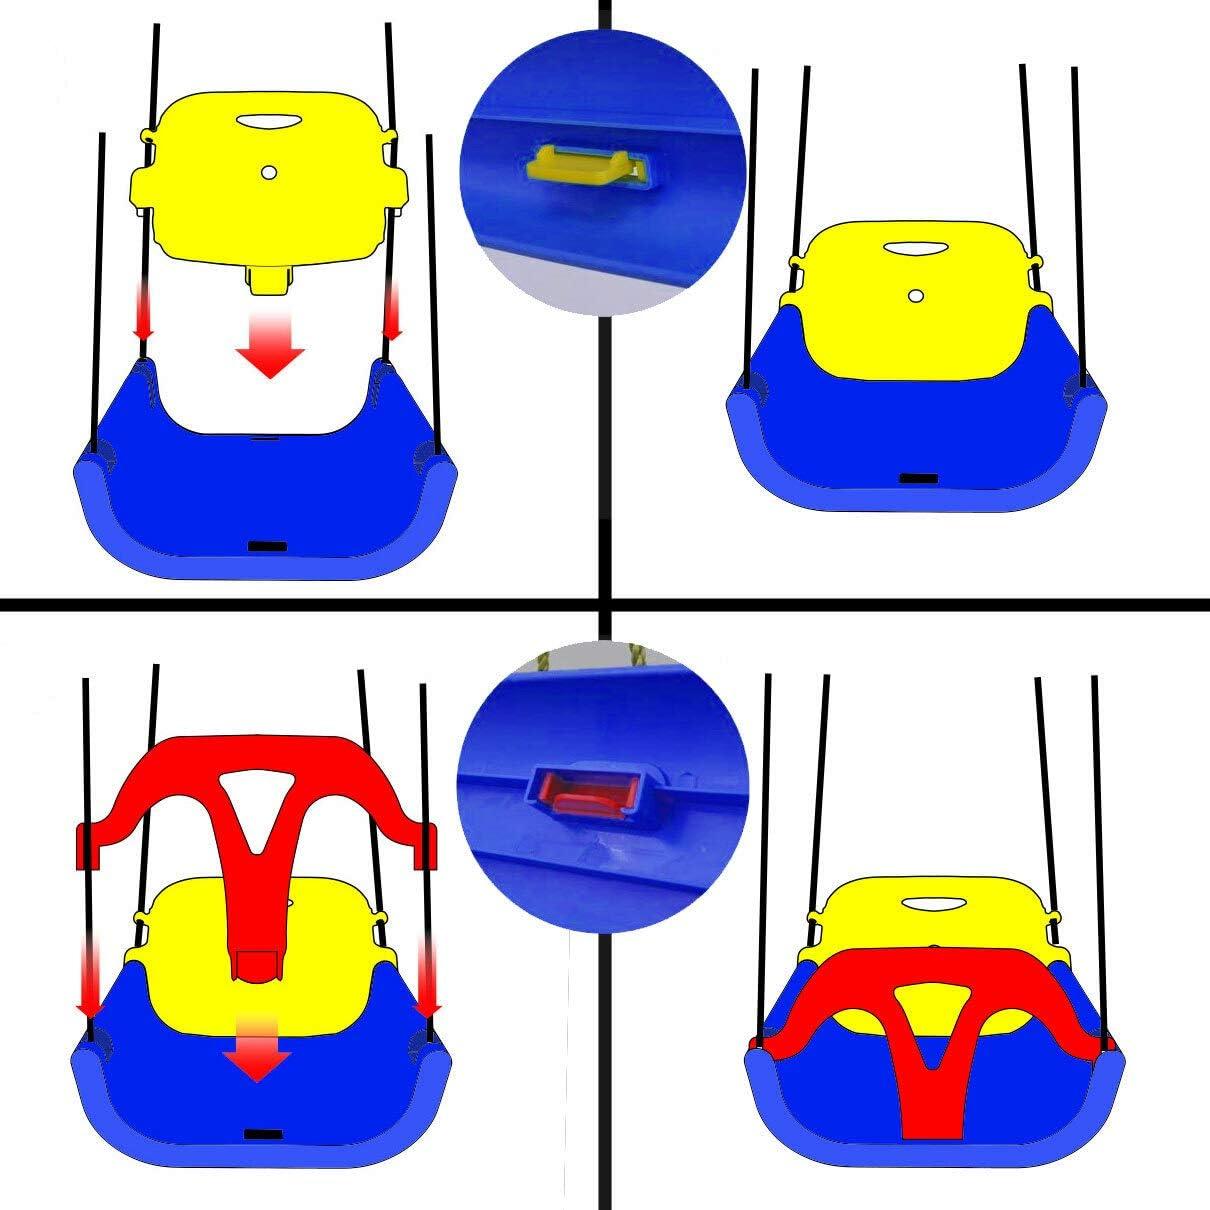 LittleTom 3in1 Toddler Swing Chair 40x43x33cm Garden Baby Seat Blue-Yellow